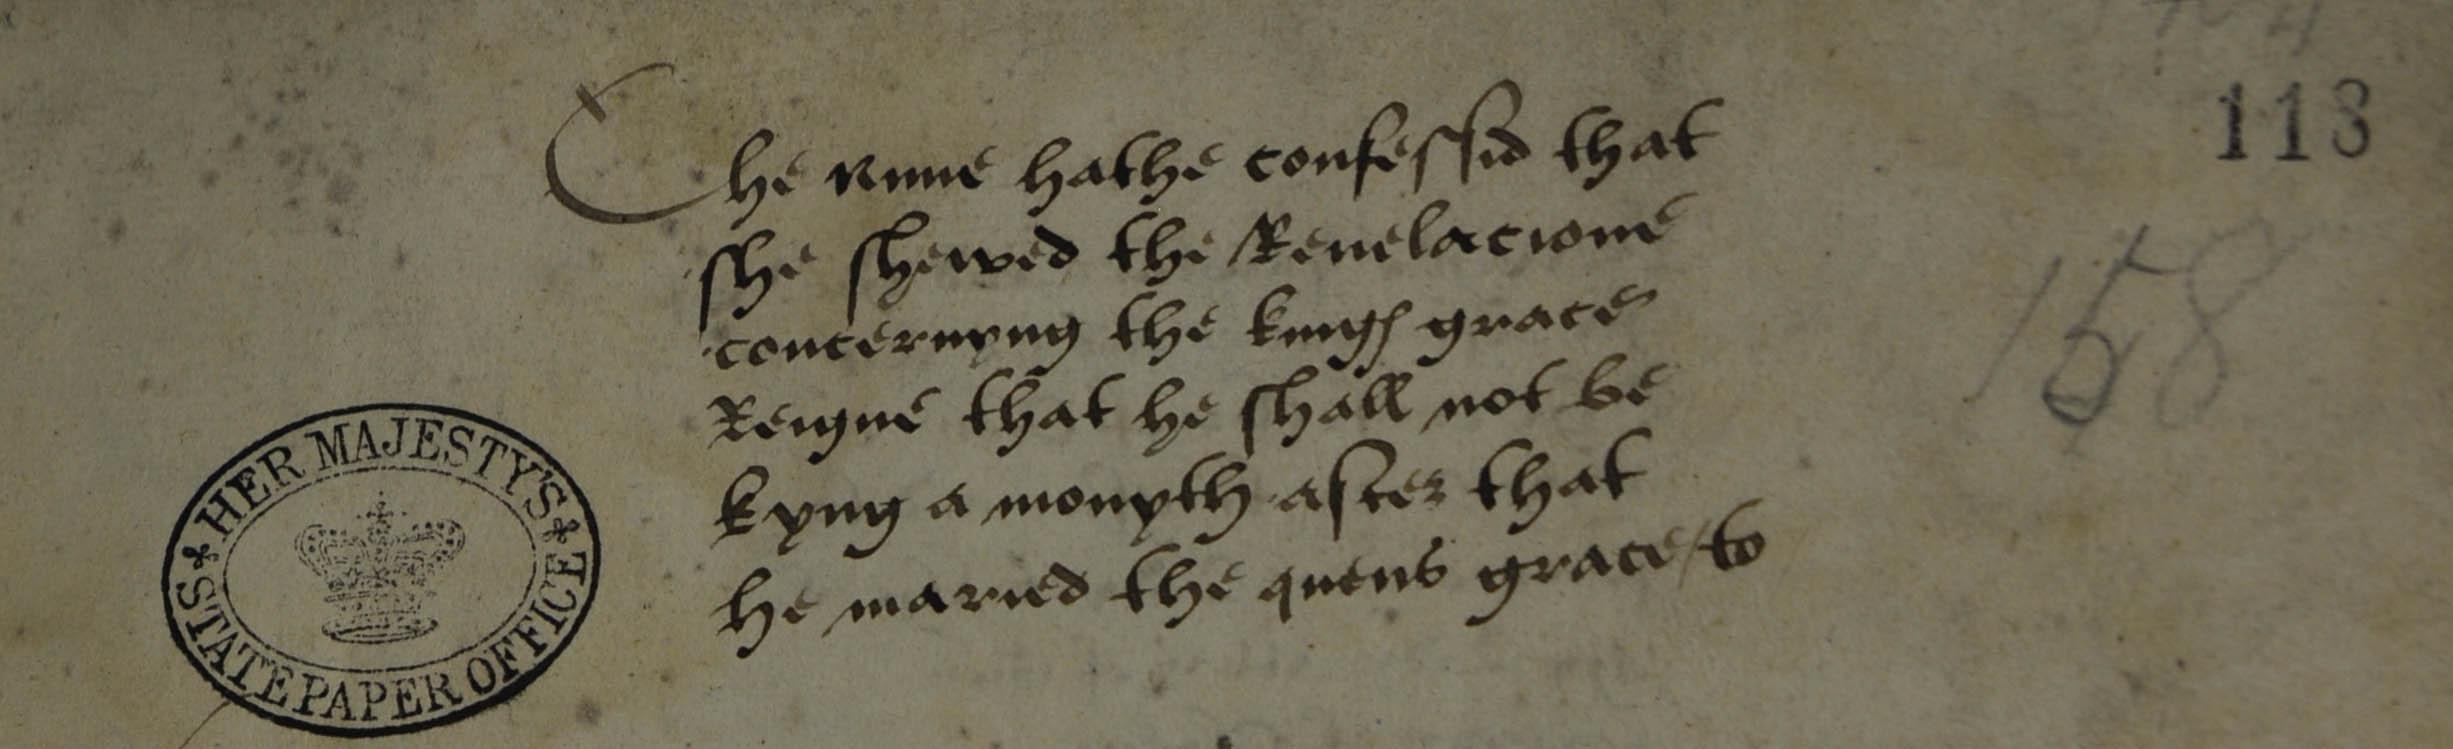 The case against Elizabeth Barton (SP 1/80 f.118).